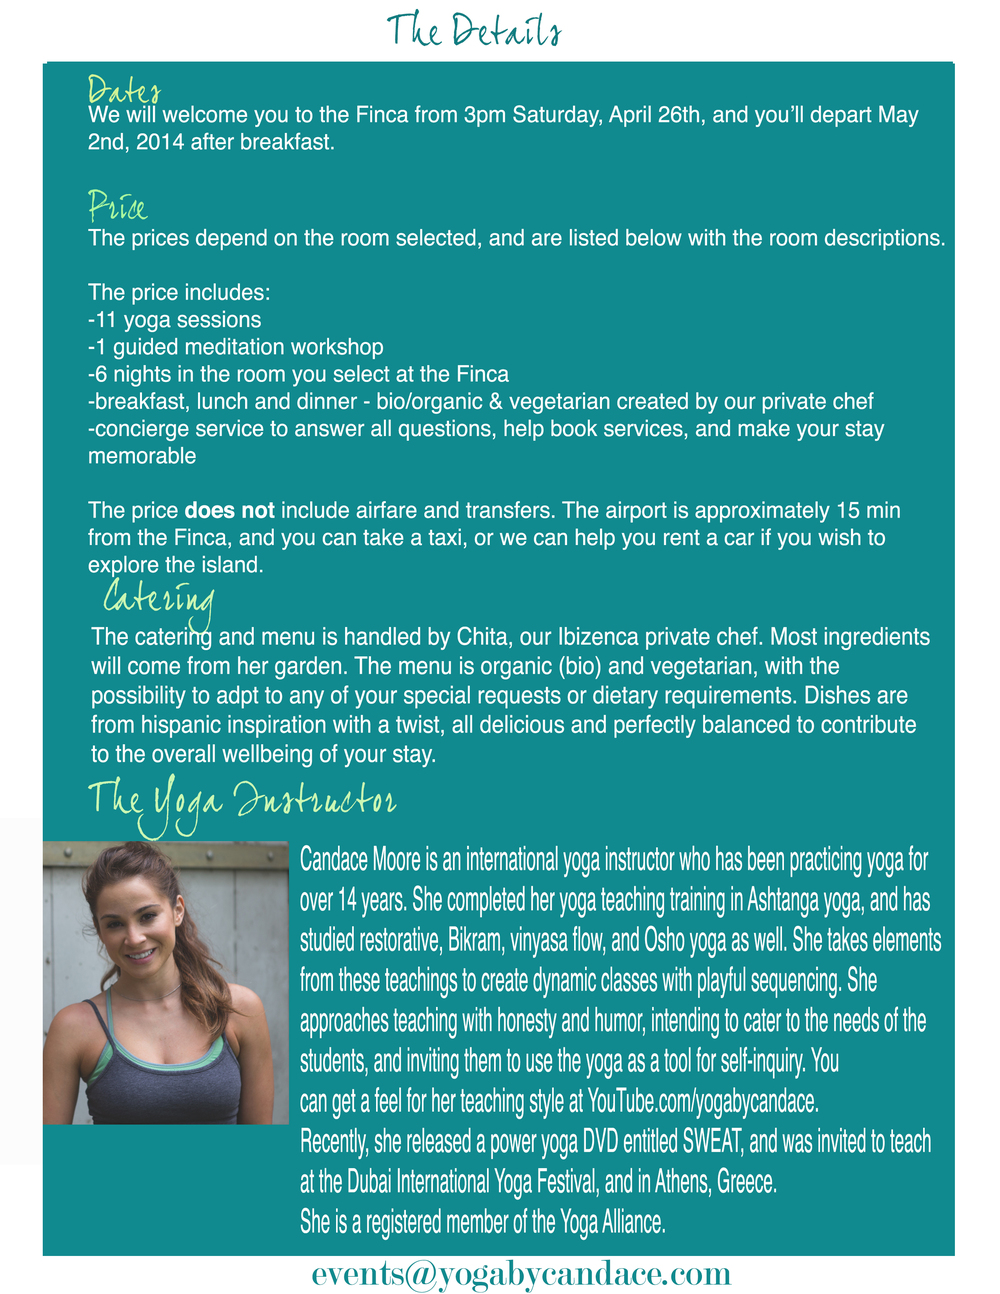 Yoga retreat details